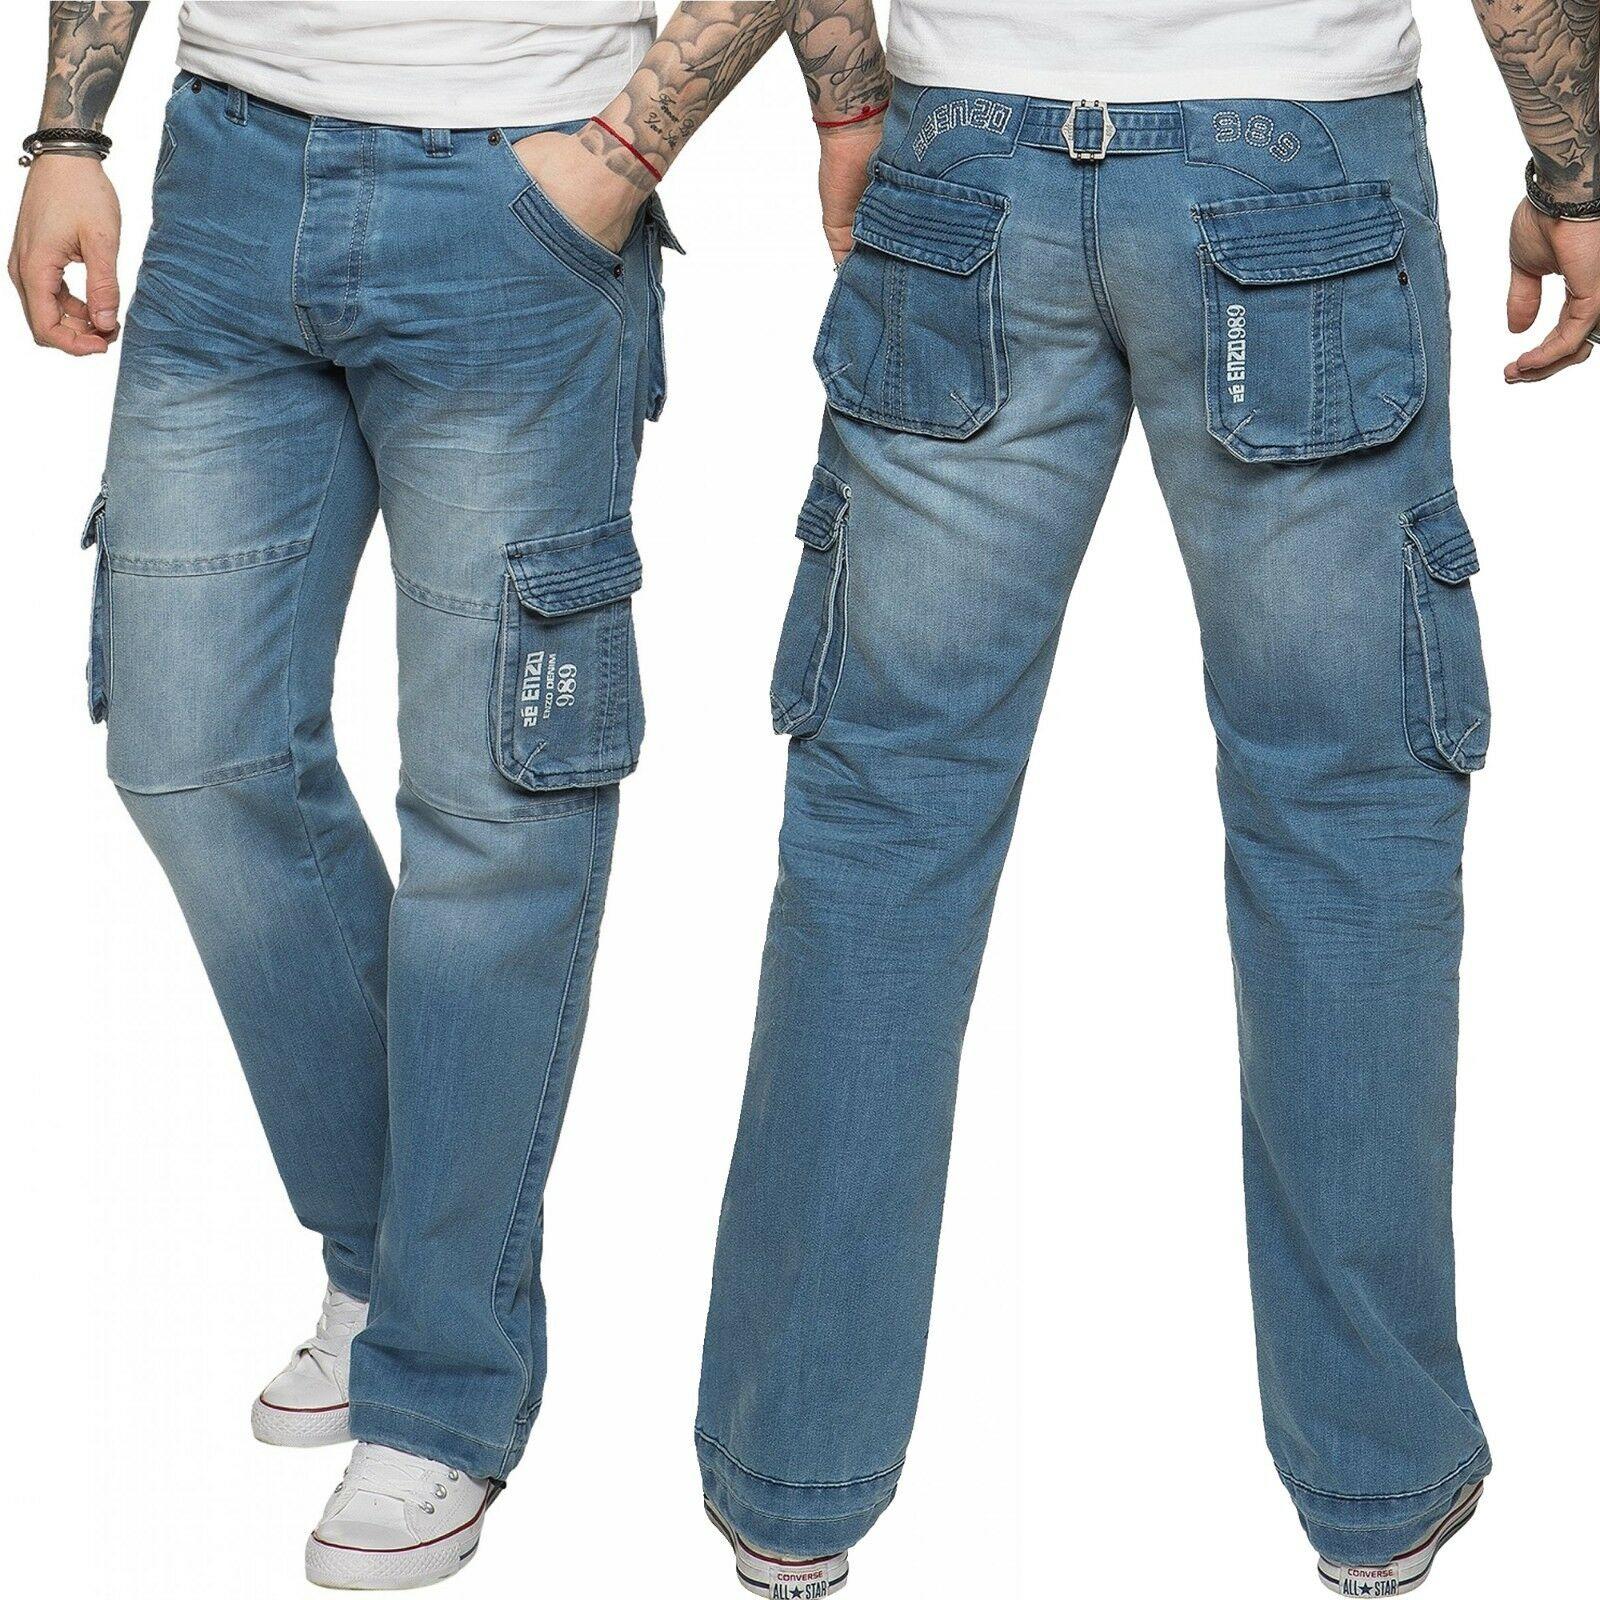 Men/'s Designer Jeans Denim Casual Pants Straight Leg 30 32 34 36 38 40